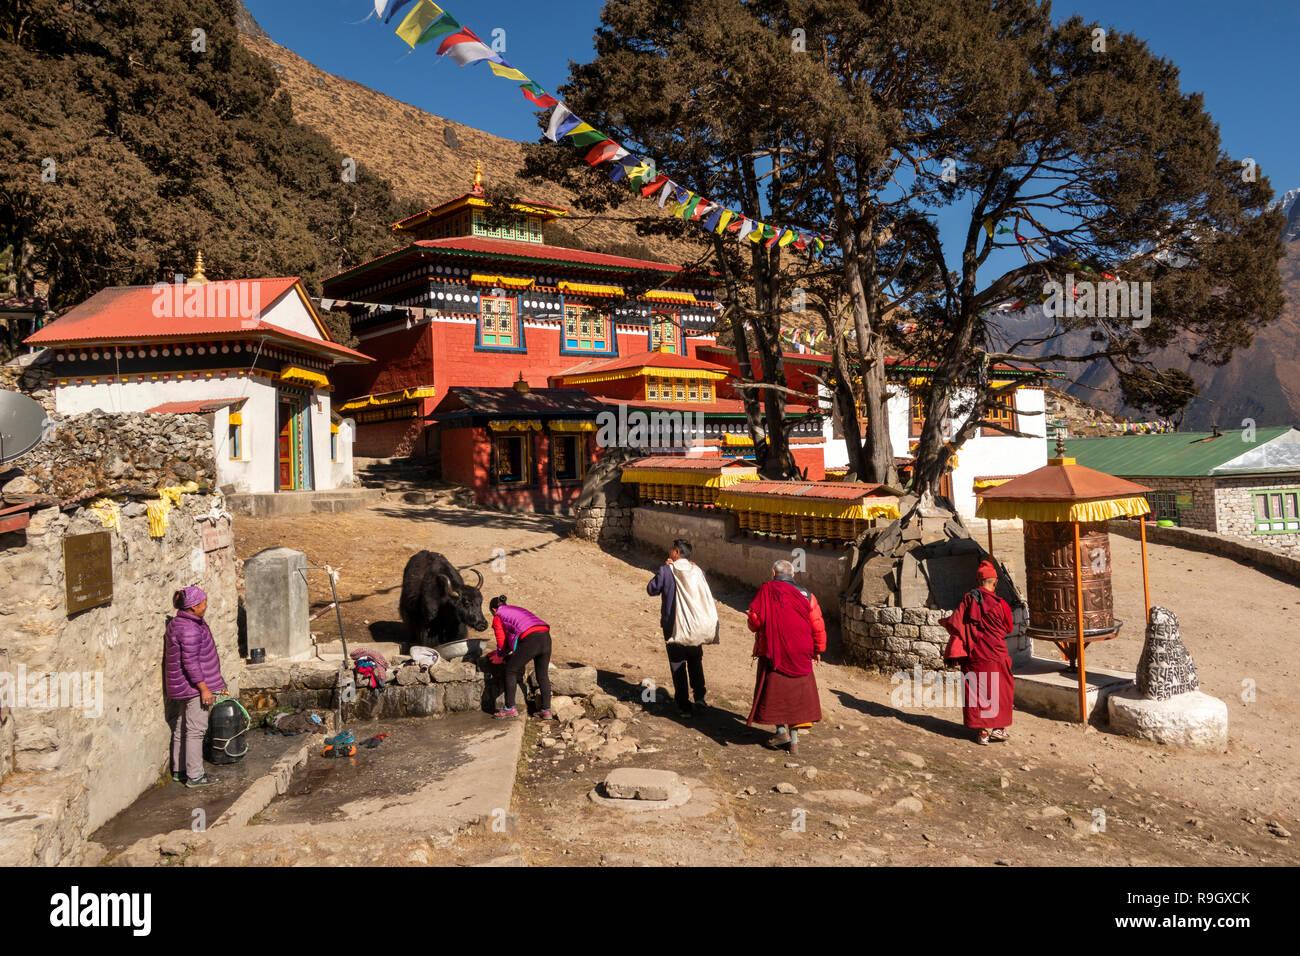 Nepal, Everest Base Camp Trek, Khumjung, monks passing traditional prayer wheels and mani stones outside village gompa - Stock Image